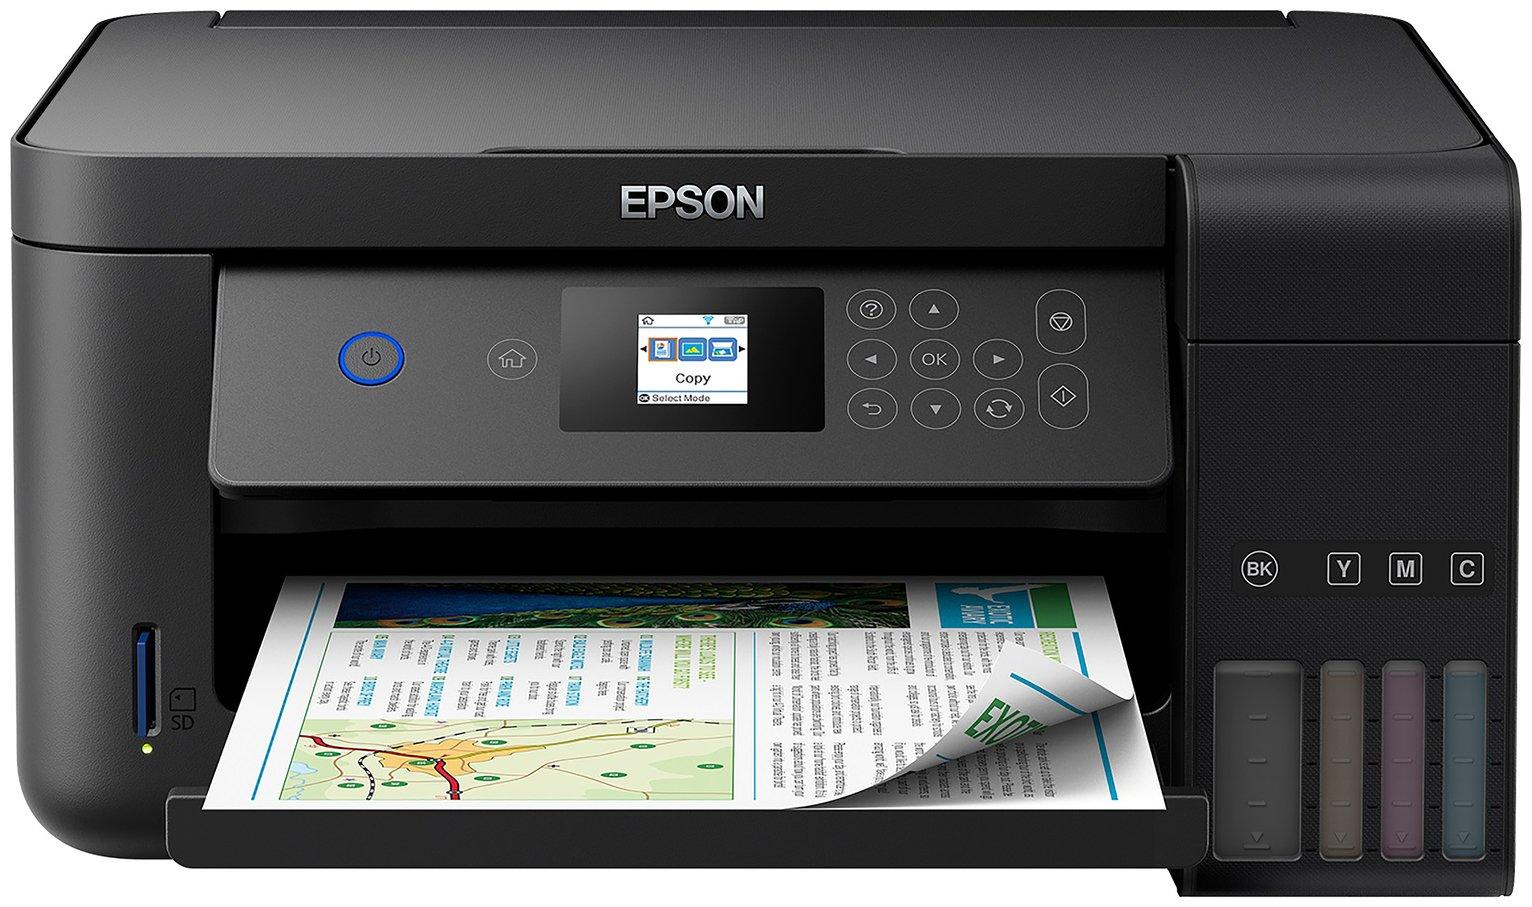 Epson EcoTank ET-2750 Wireless Ink Tank Printer